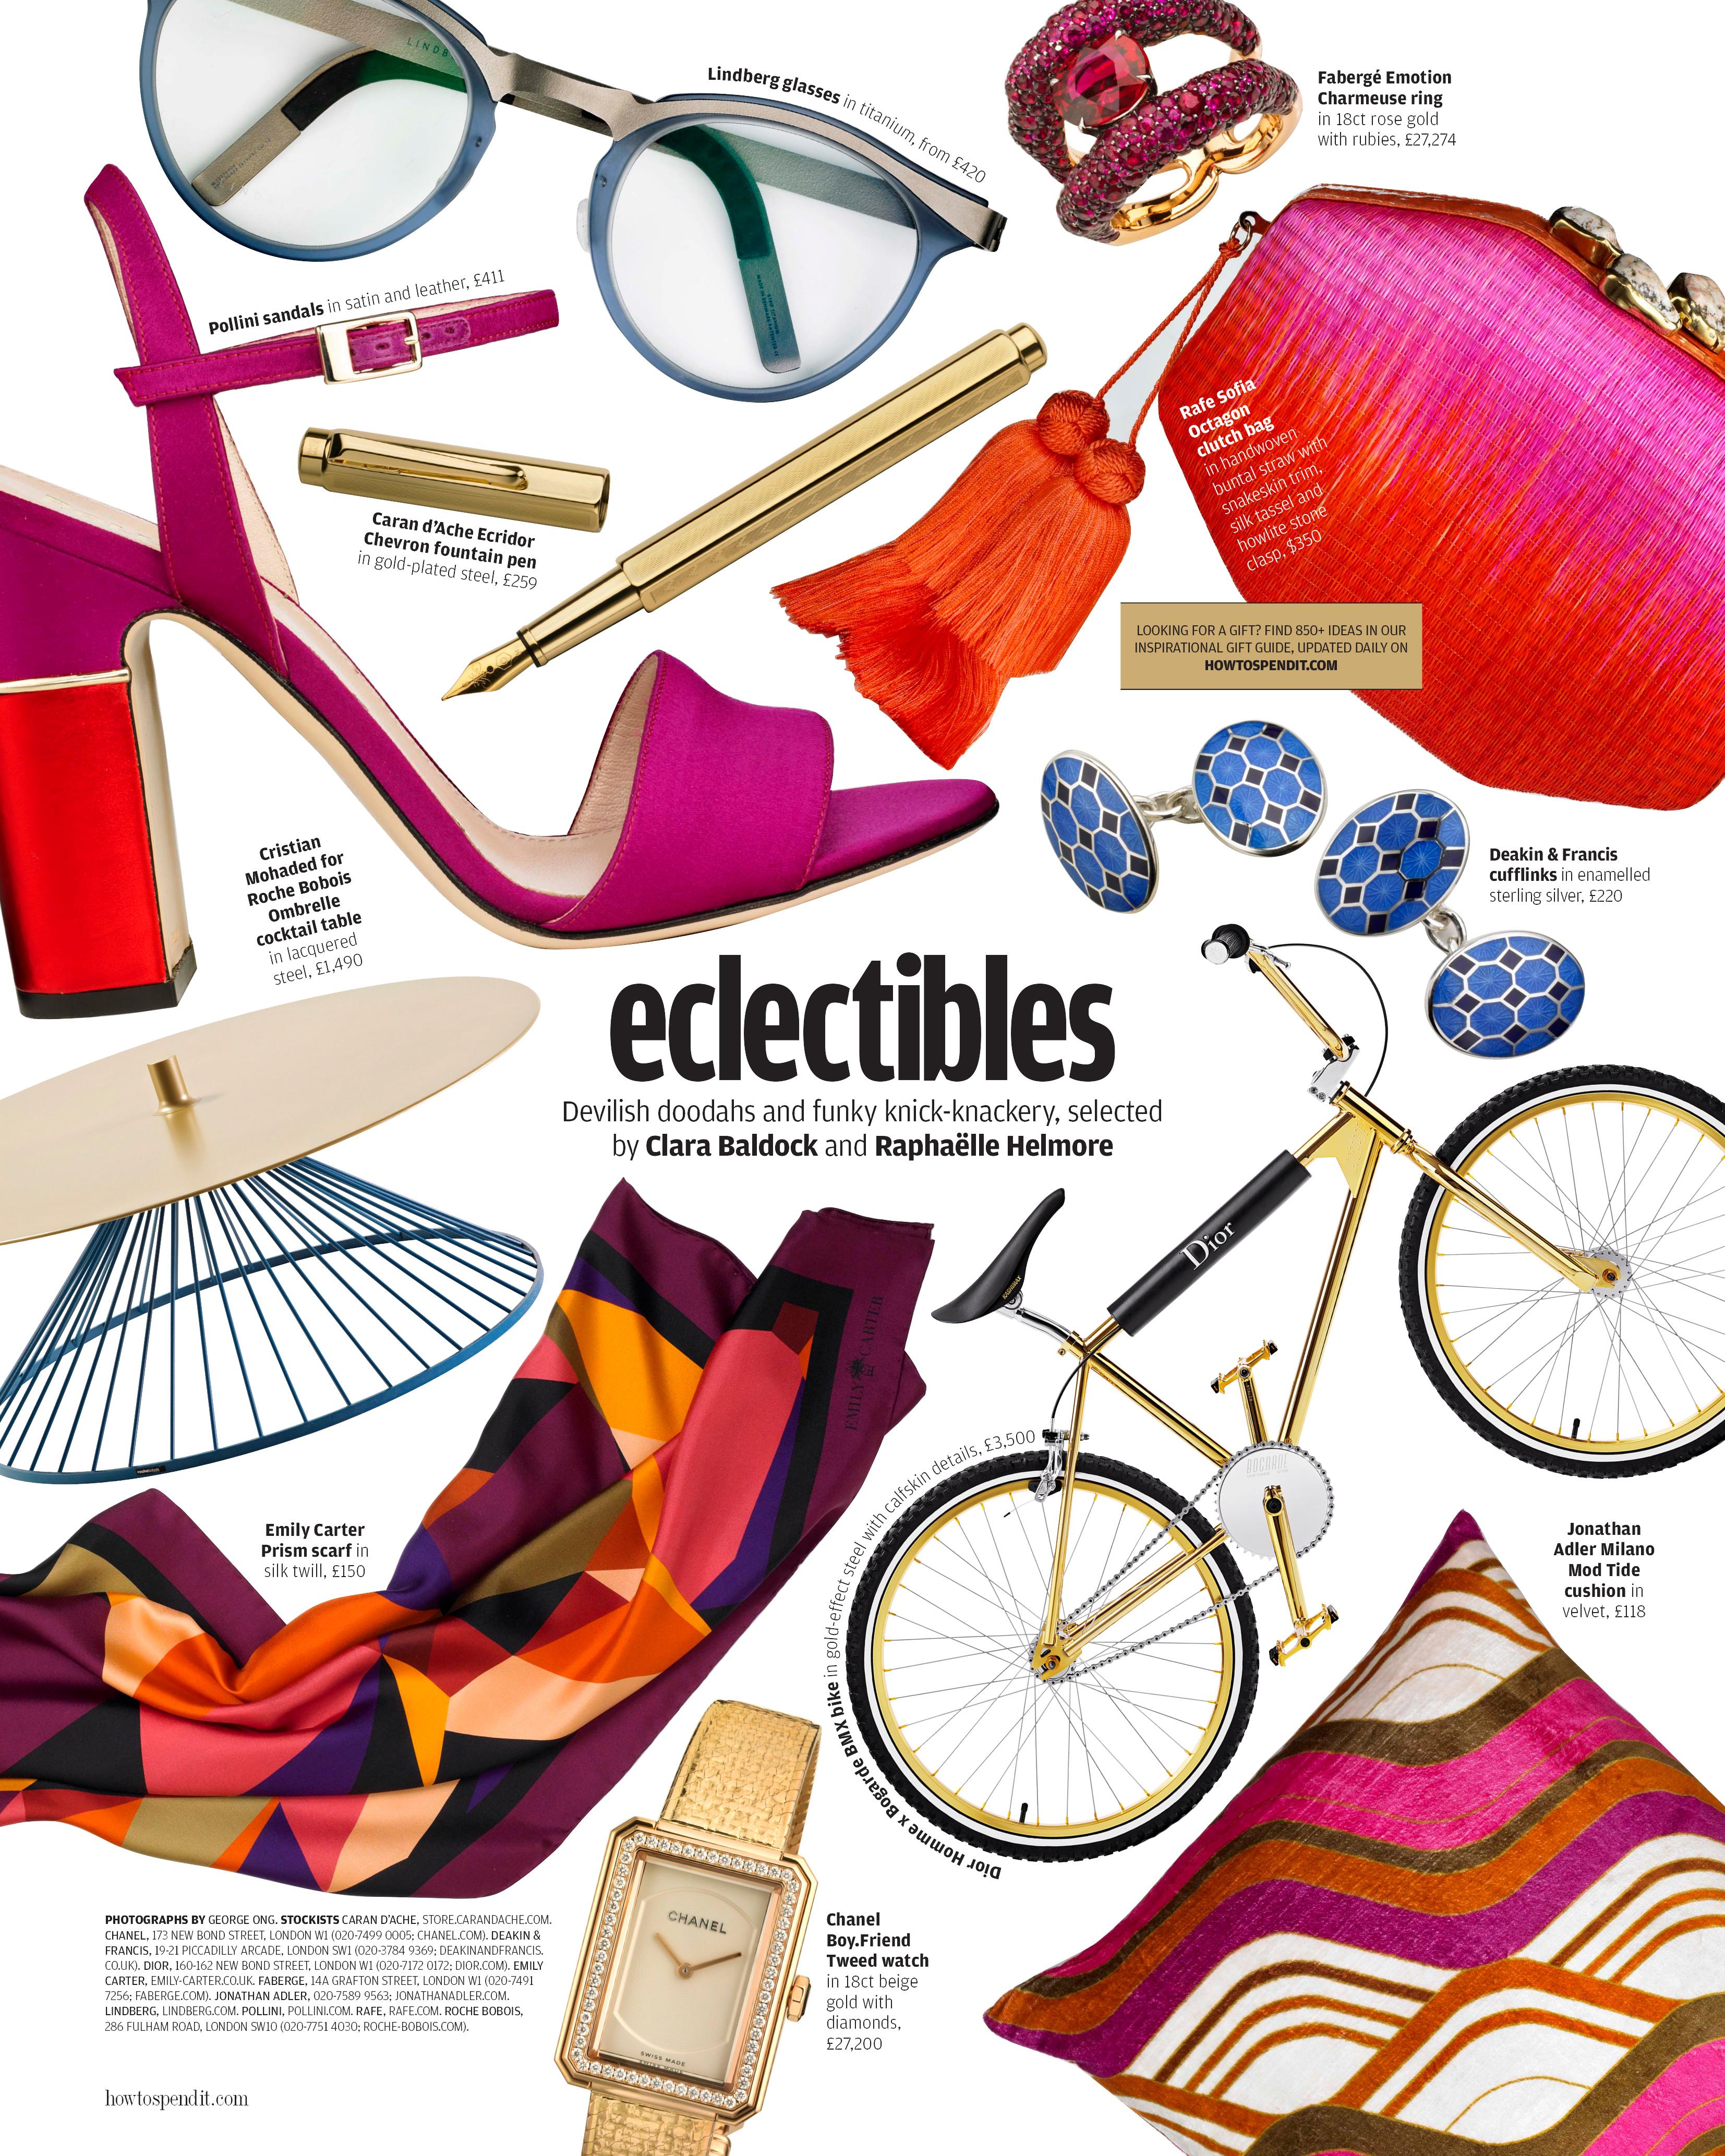 Emily Carter Press: Eclectibles